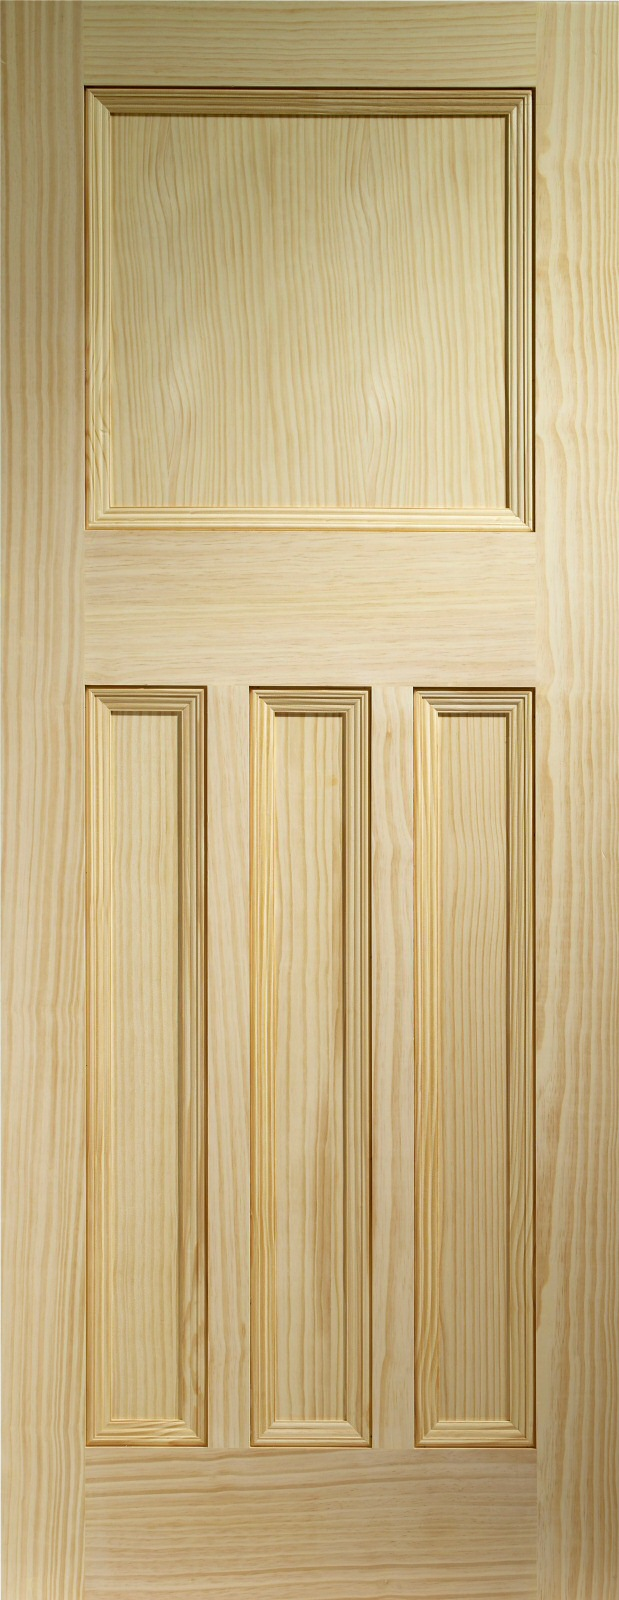 28 X 78 Interior Vine Dx 30s Style Clear Pine Door